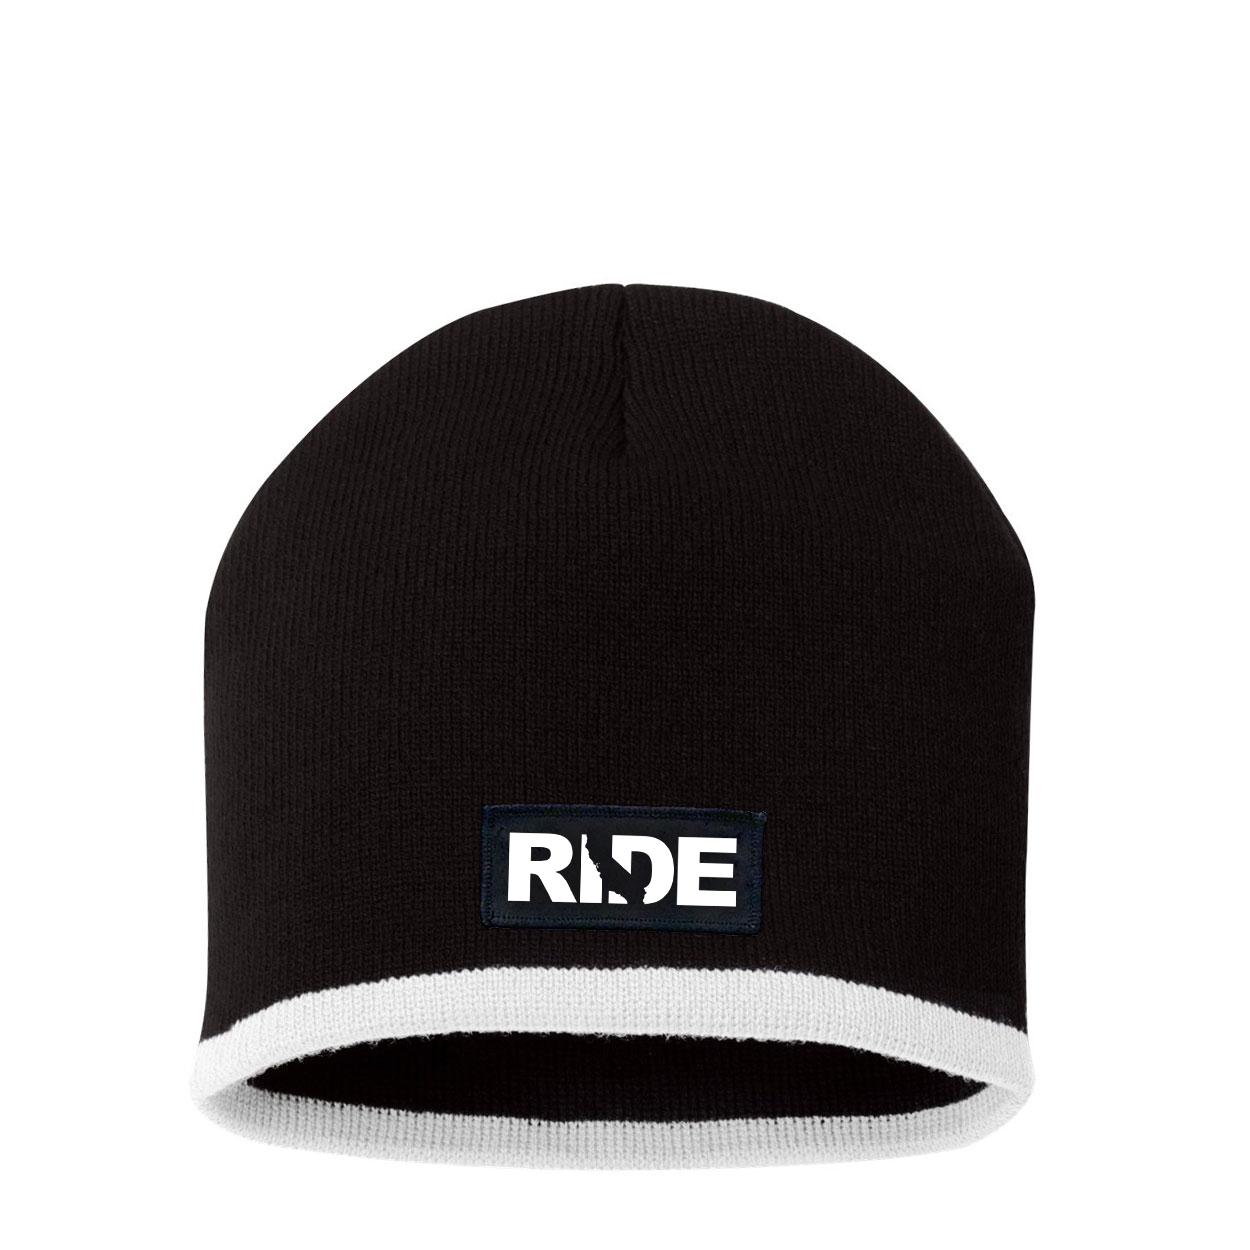 Ride California Night Out Woven Patch Skully Beanie Black/White (White Logo)